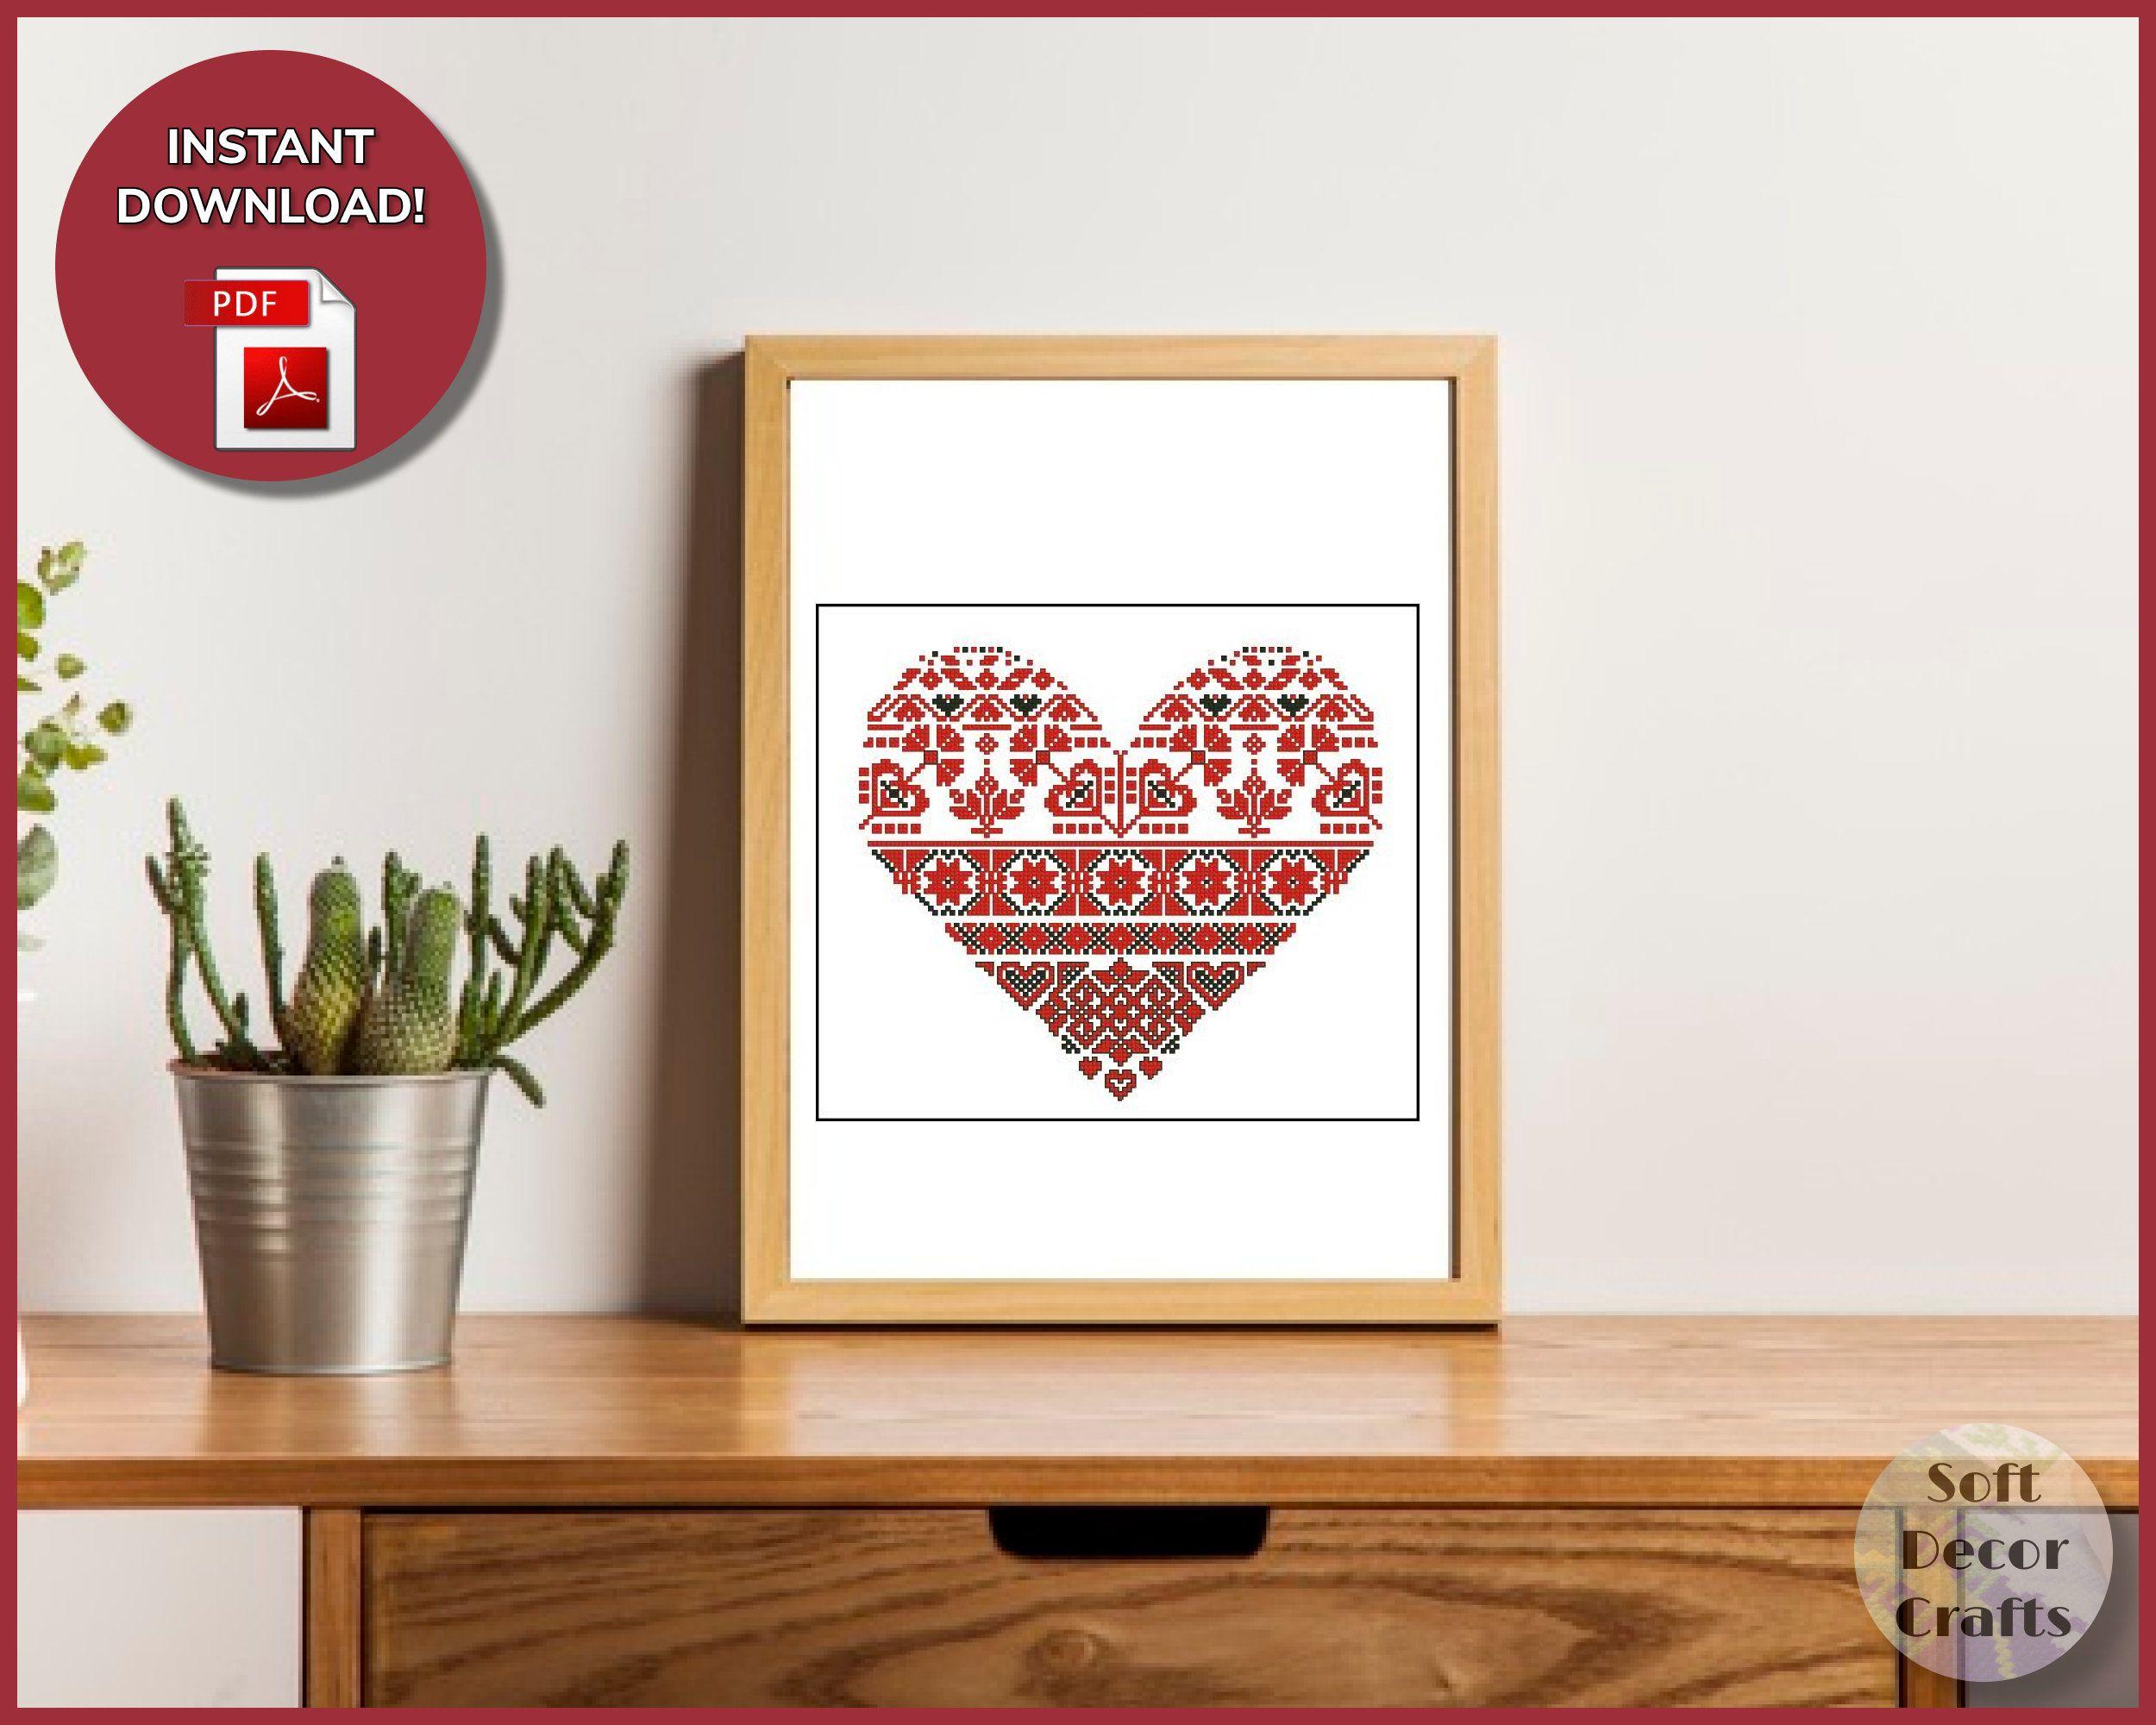 Sampler Heart Ornament Cross Stitch Pattern, Red Pillow Embroidery, Primitive Cross Stitch, Digital PDF, Easy Cross Stitch, Home Decor